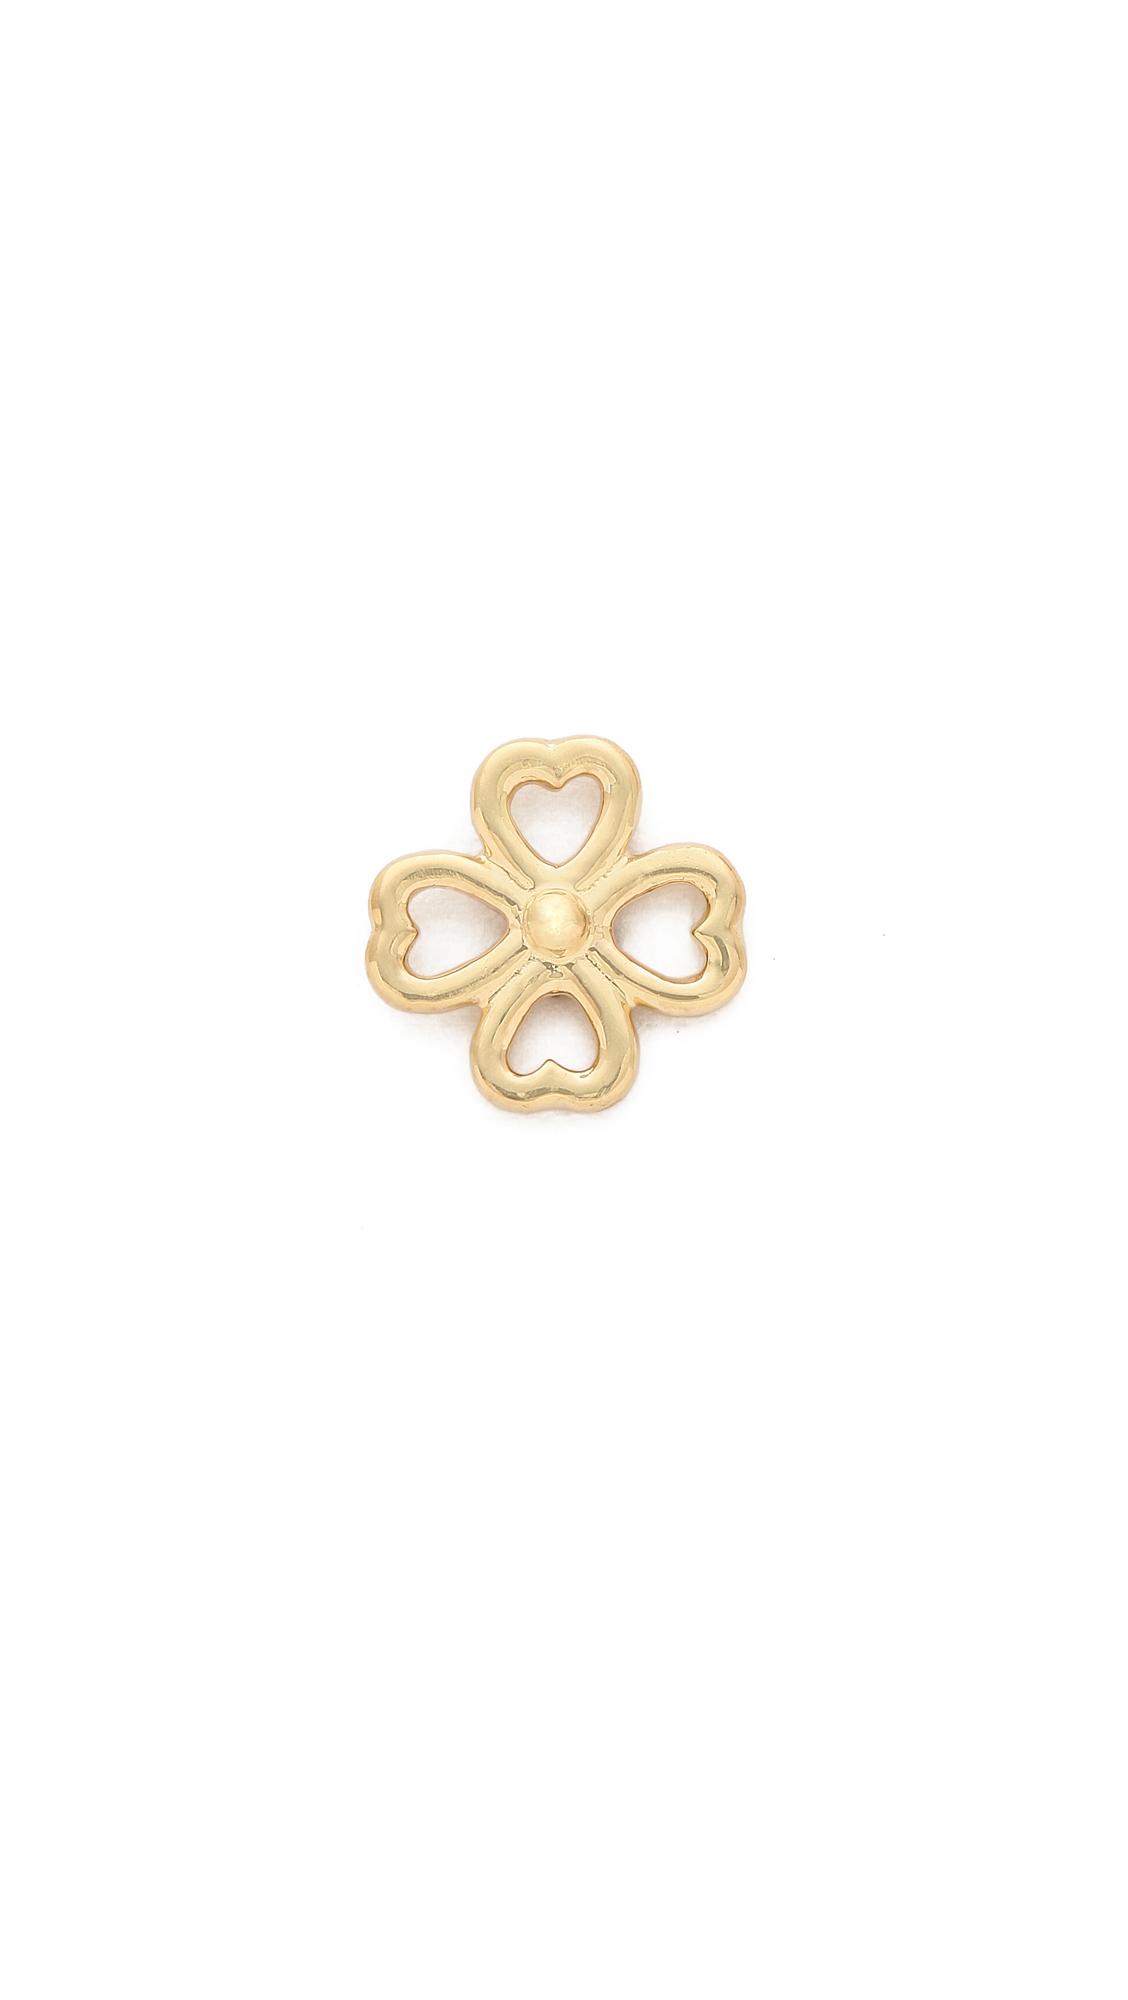 Aurelie Bidermann Mini Clover Stud Earring - Gold at Shopbop